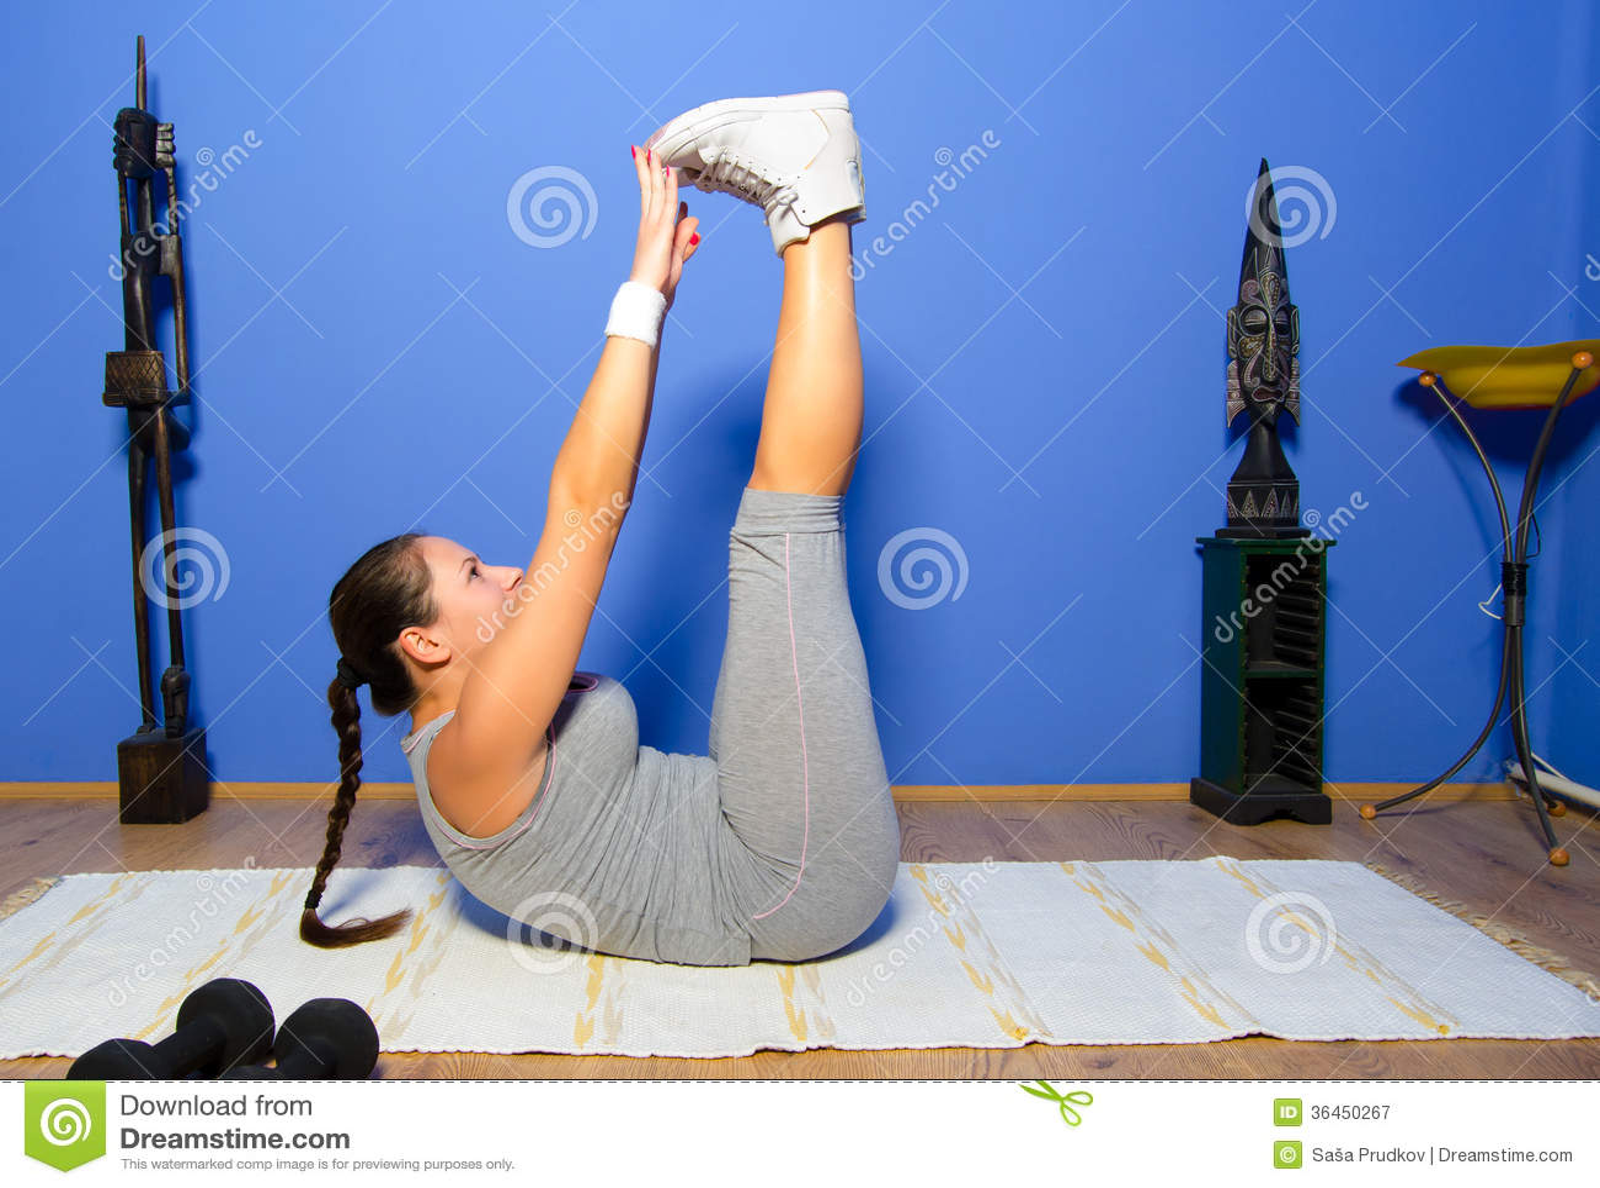 Girl exercising at home